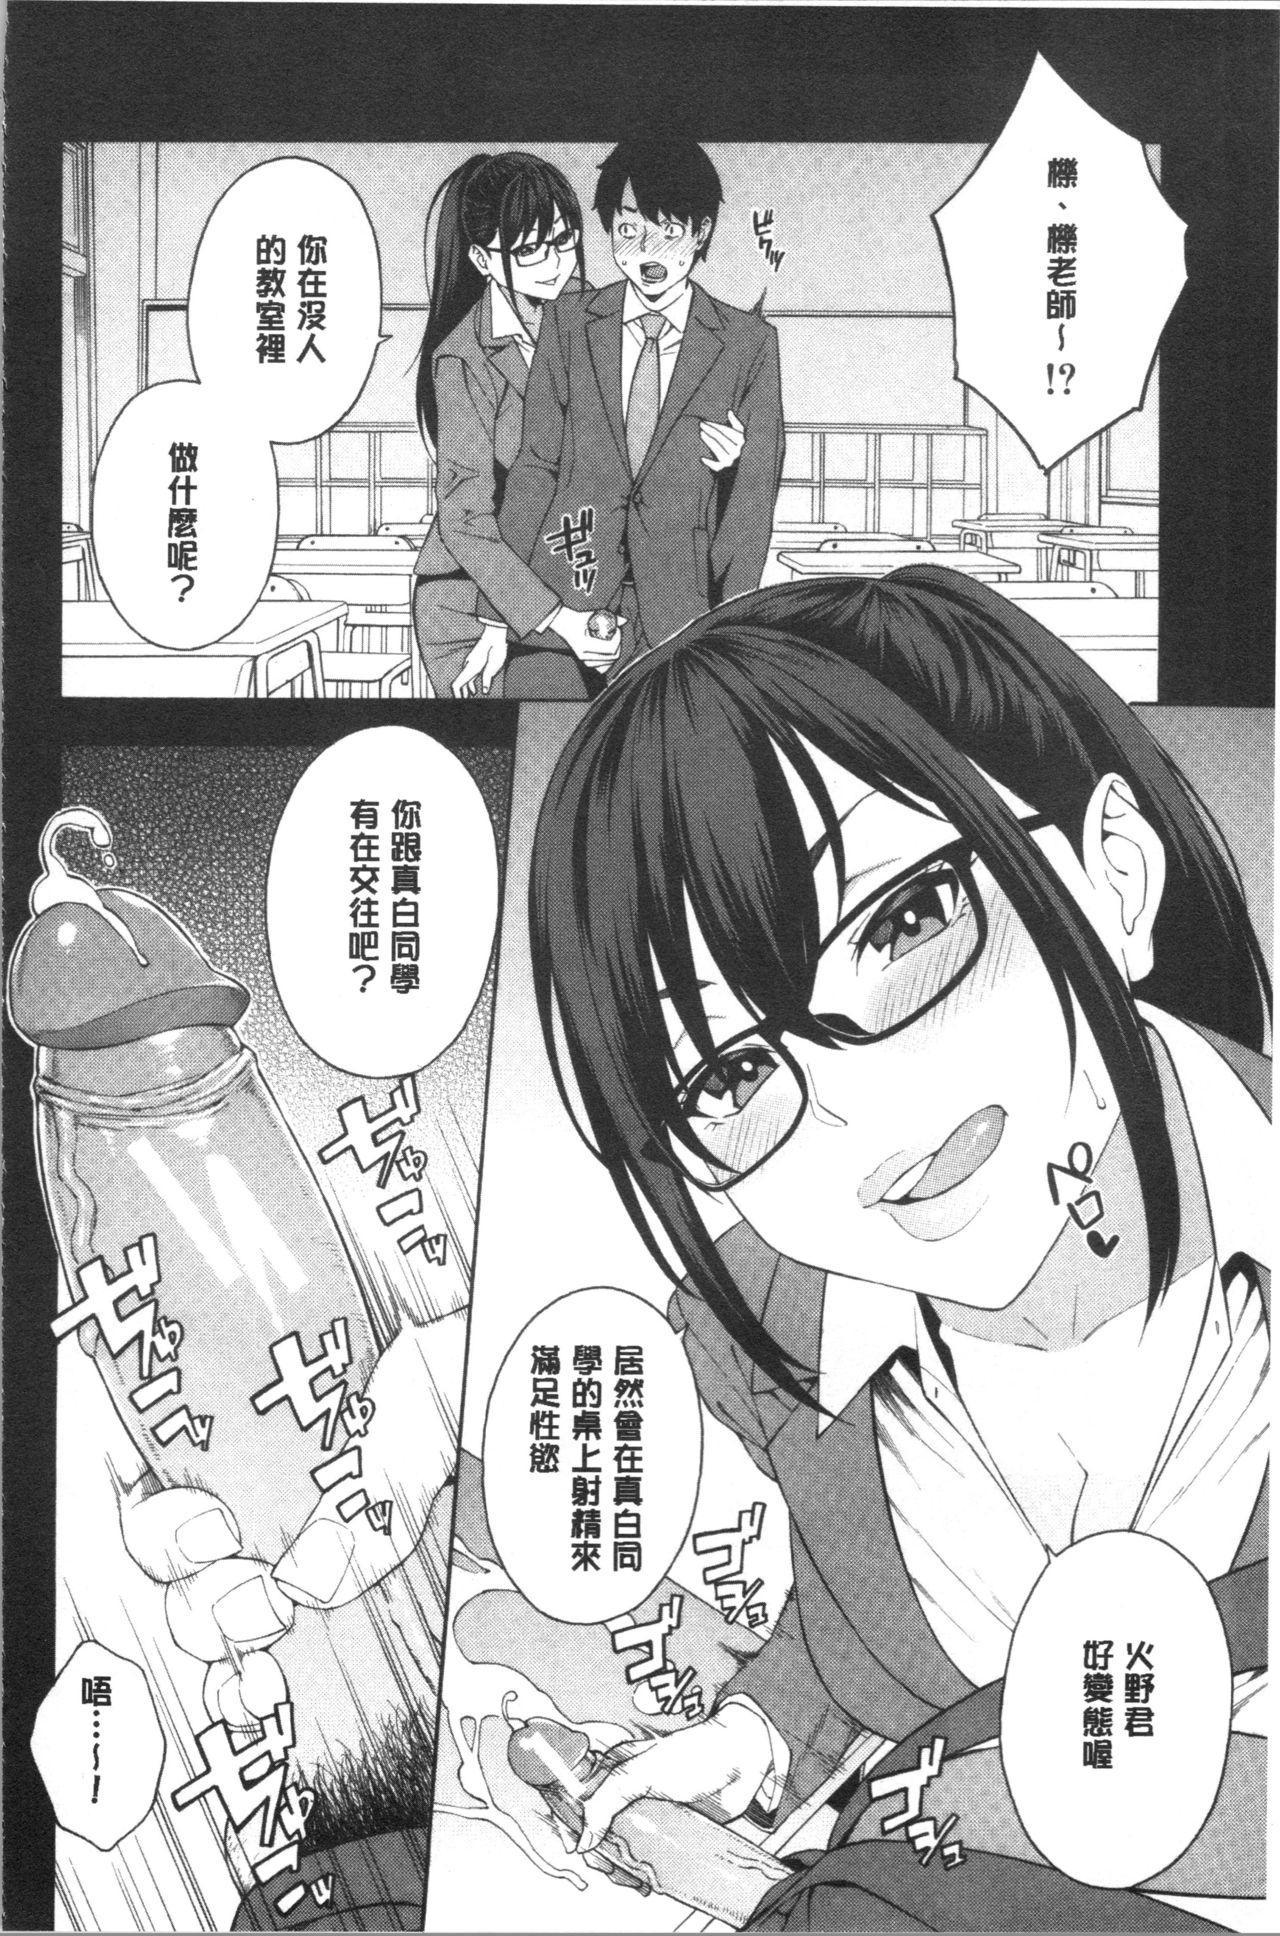 Okashite Ageru | 讓你來侵犯我 48